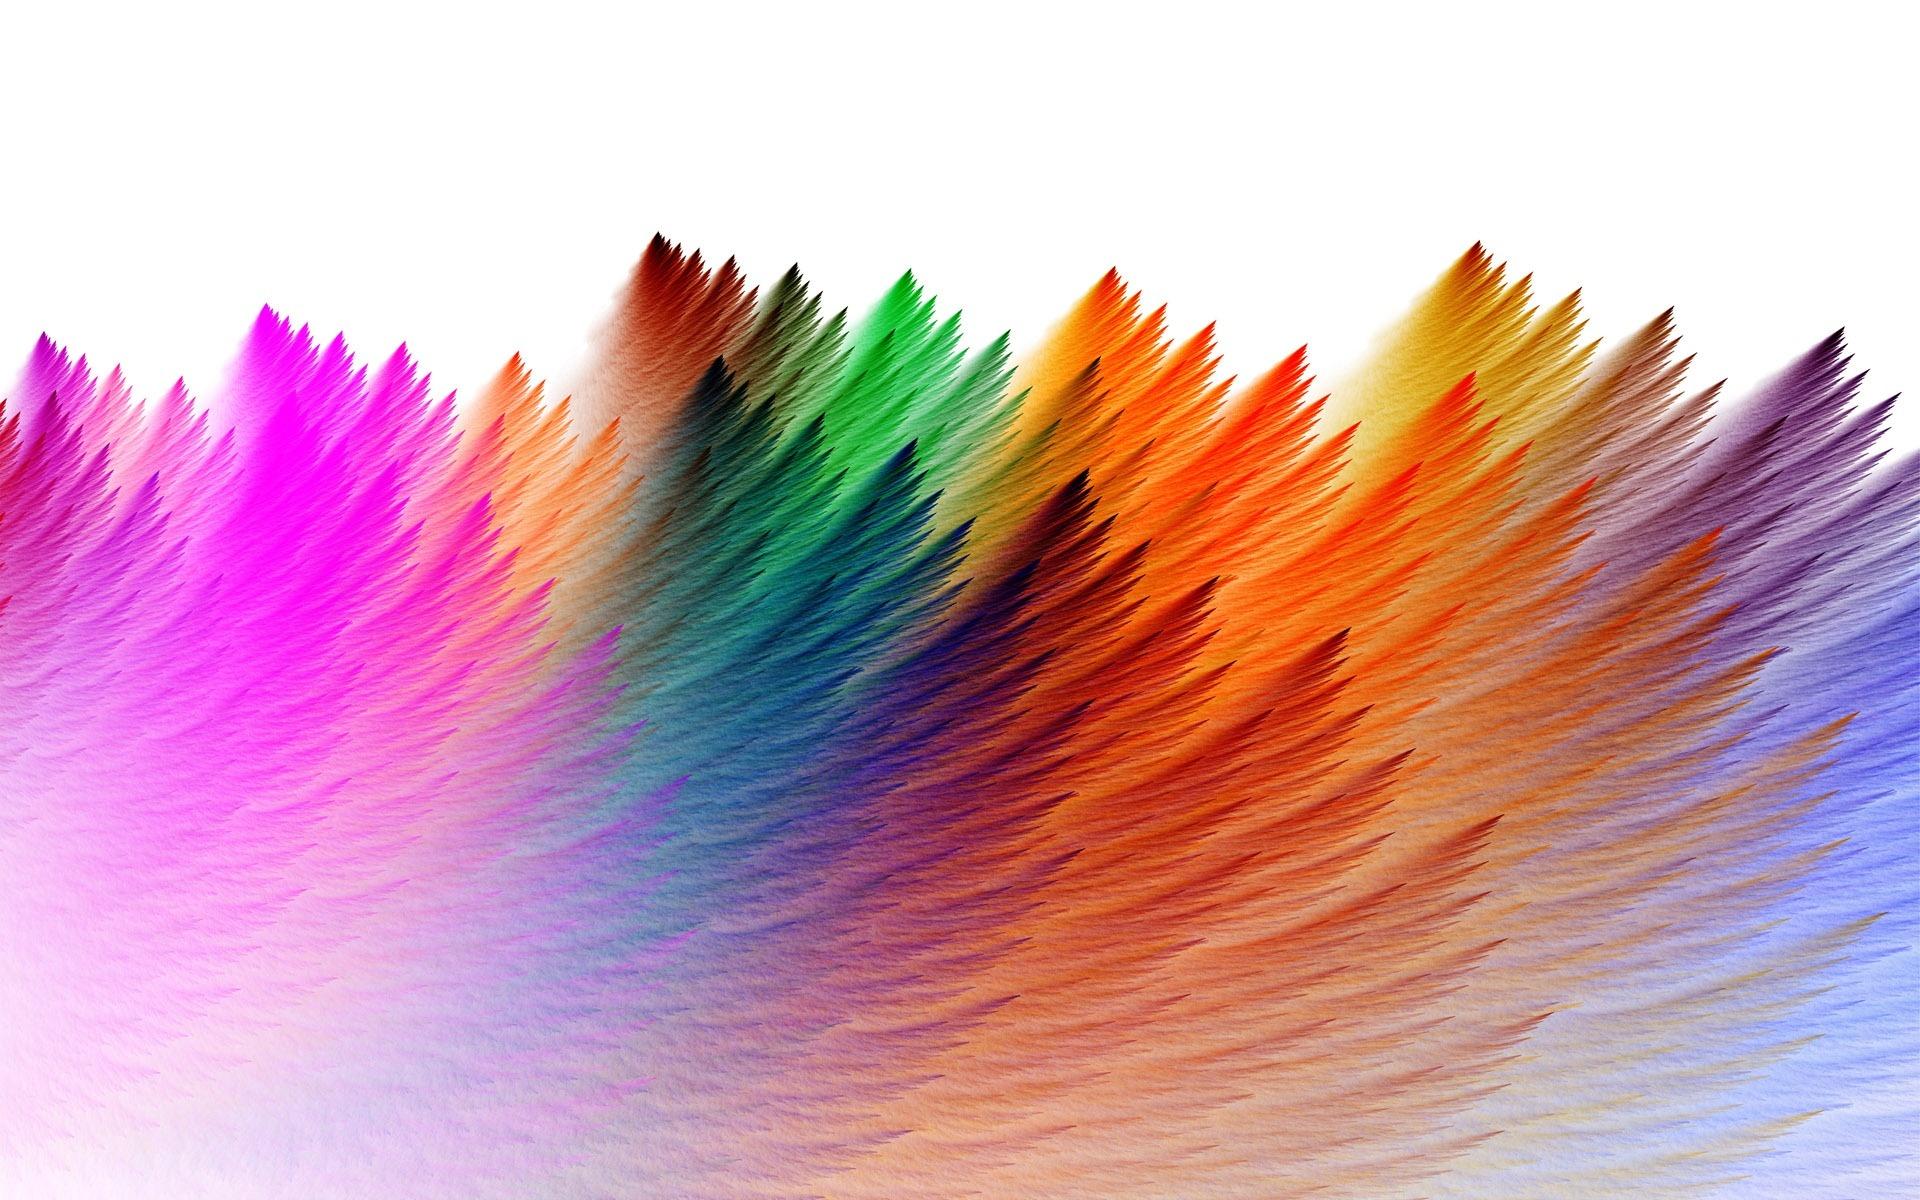 Fall Leaves Phone Wallpaper Art Desktop Color Hd Wallpapers Pixelstalk Net